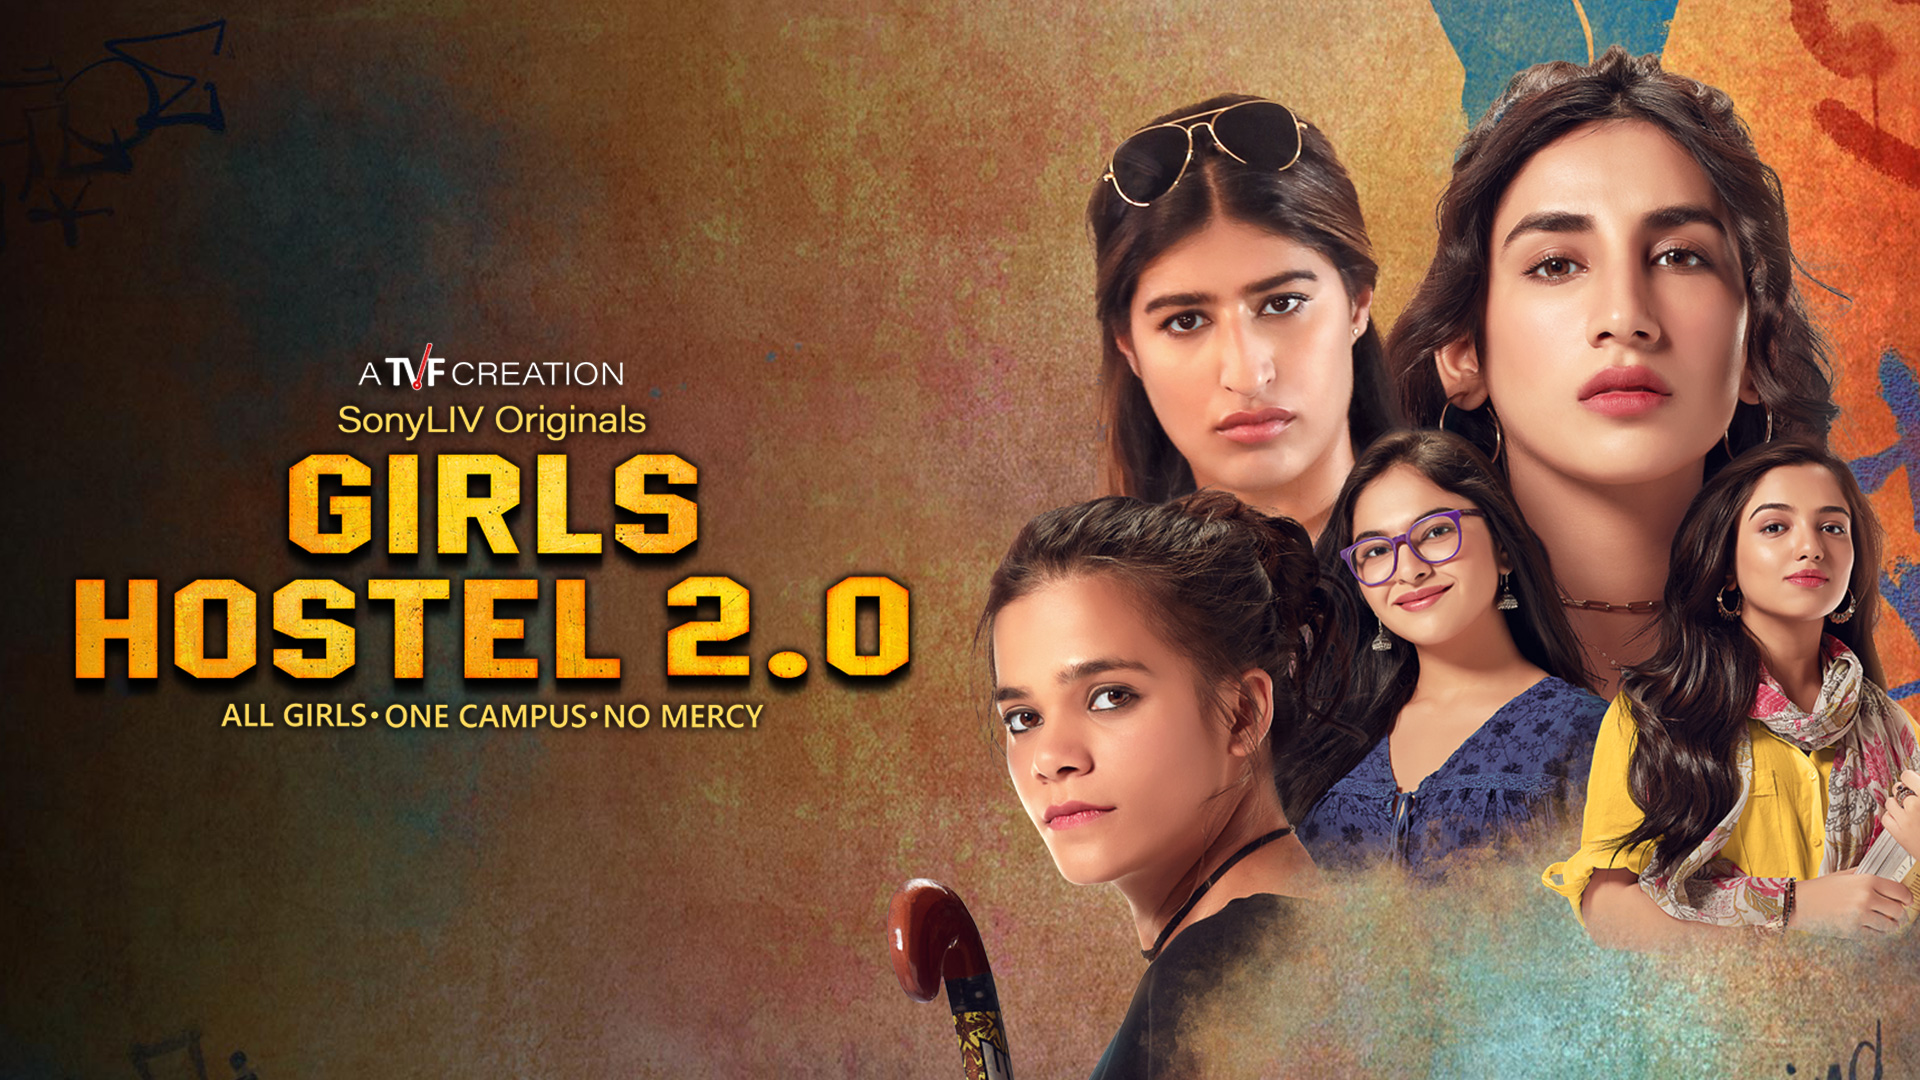 Girls Hostel (2021) HDRip Season 2 [Telugu + Tamil + Hindi + Malayalam + Kannada] download free